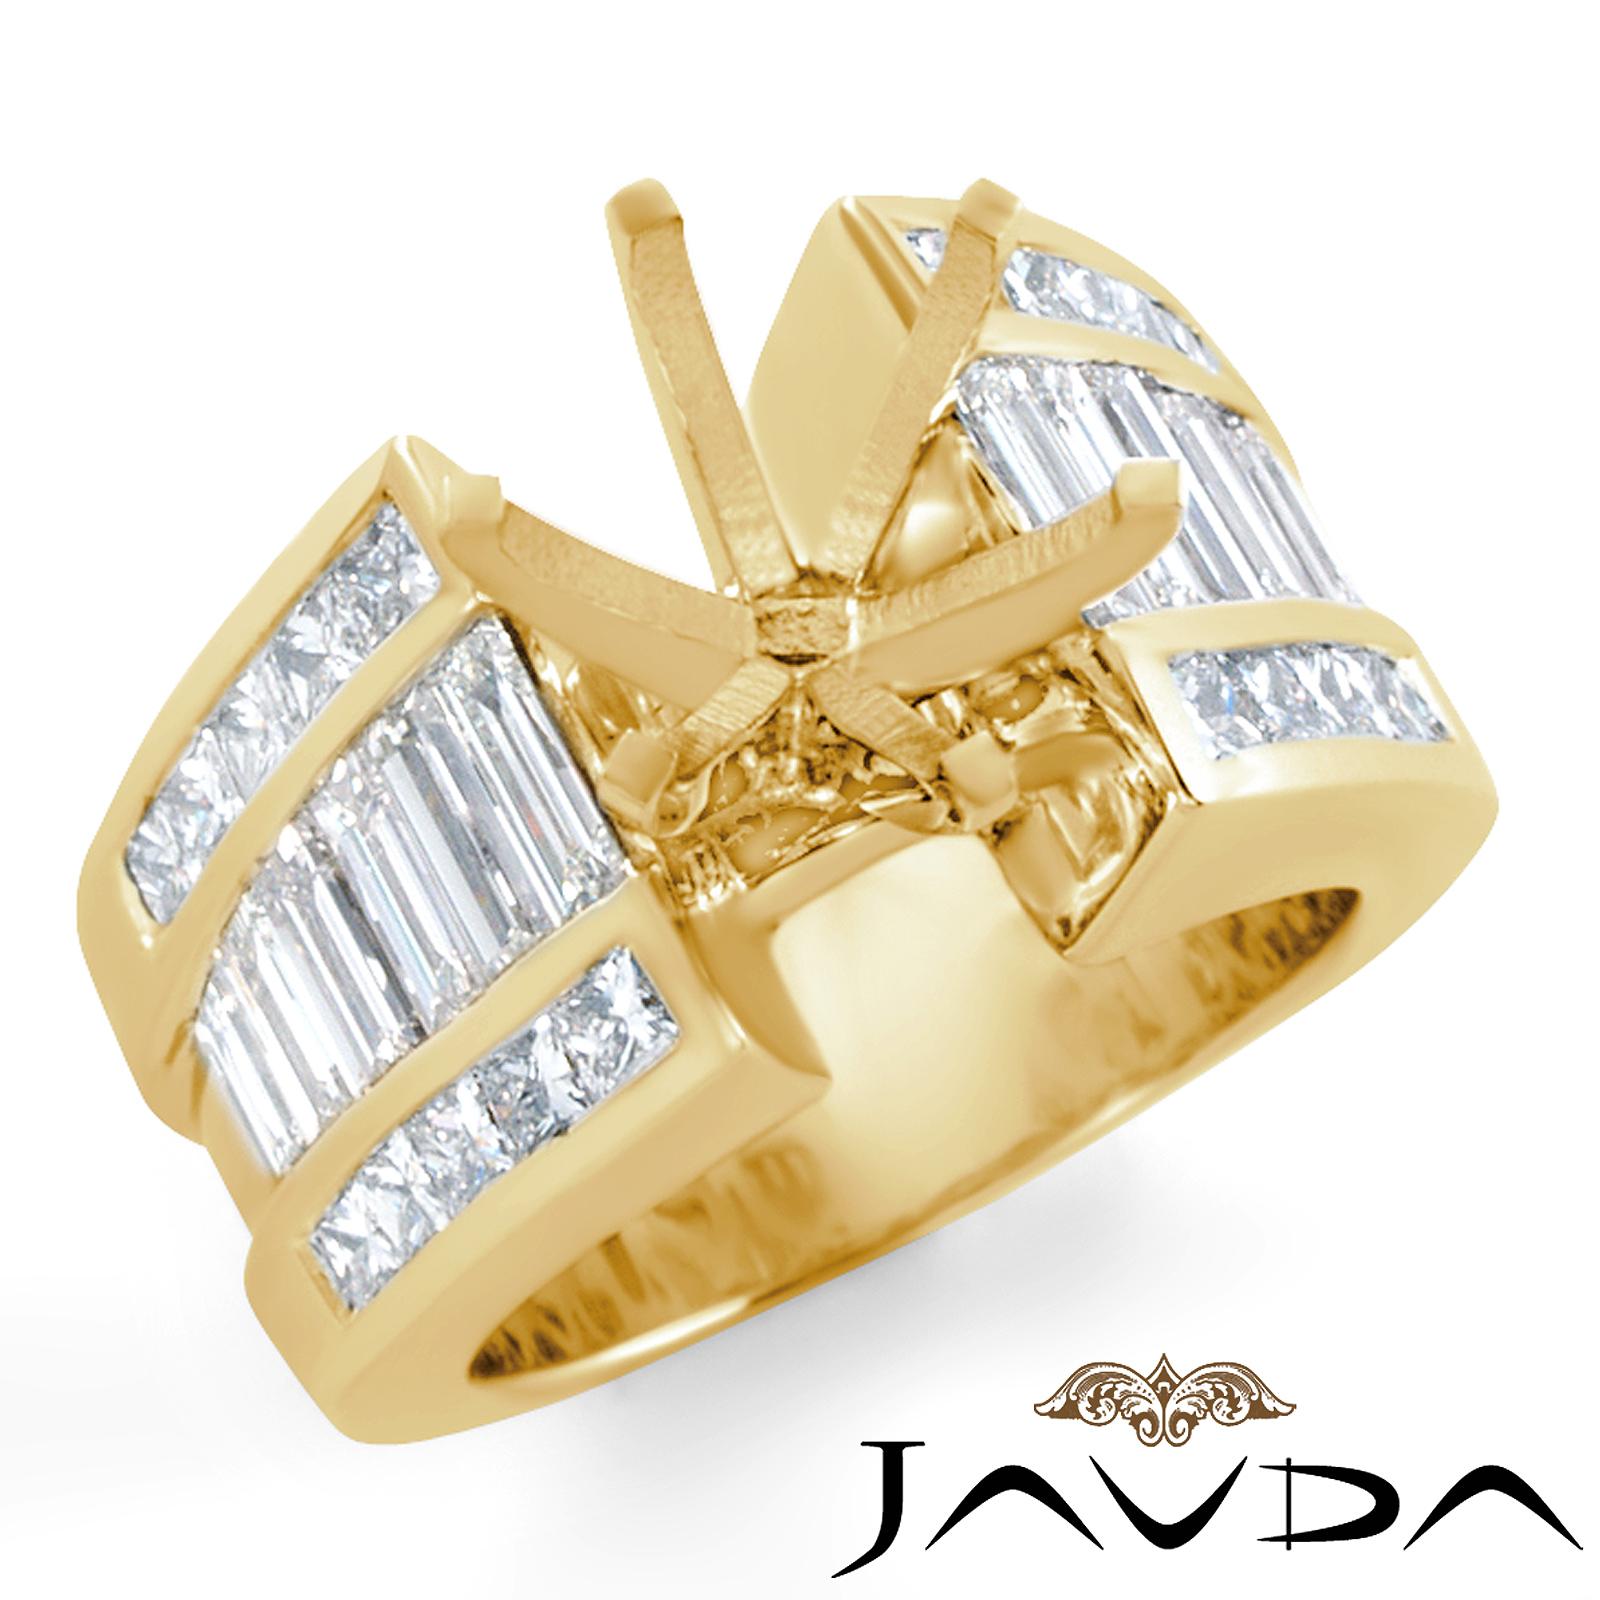 Princess Baguette Side Diamond Engagement Setting Ring 14k